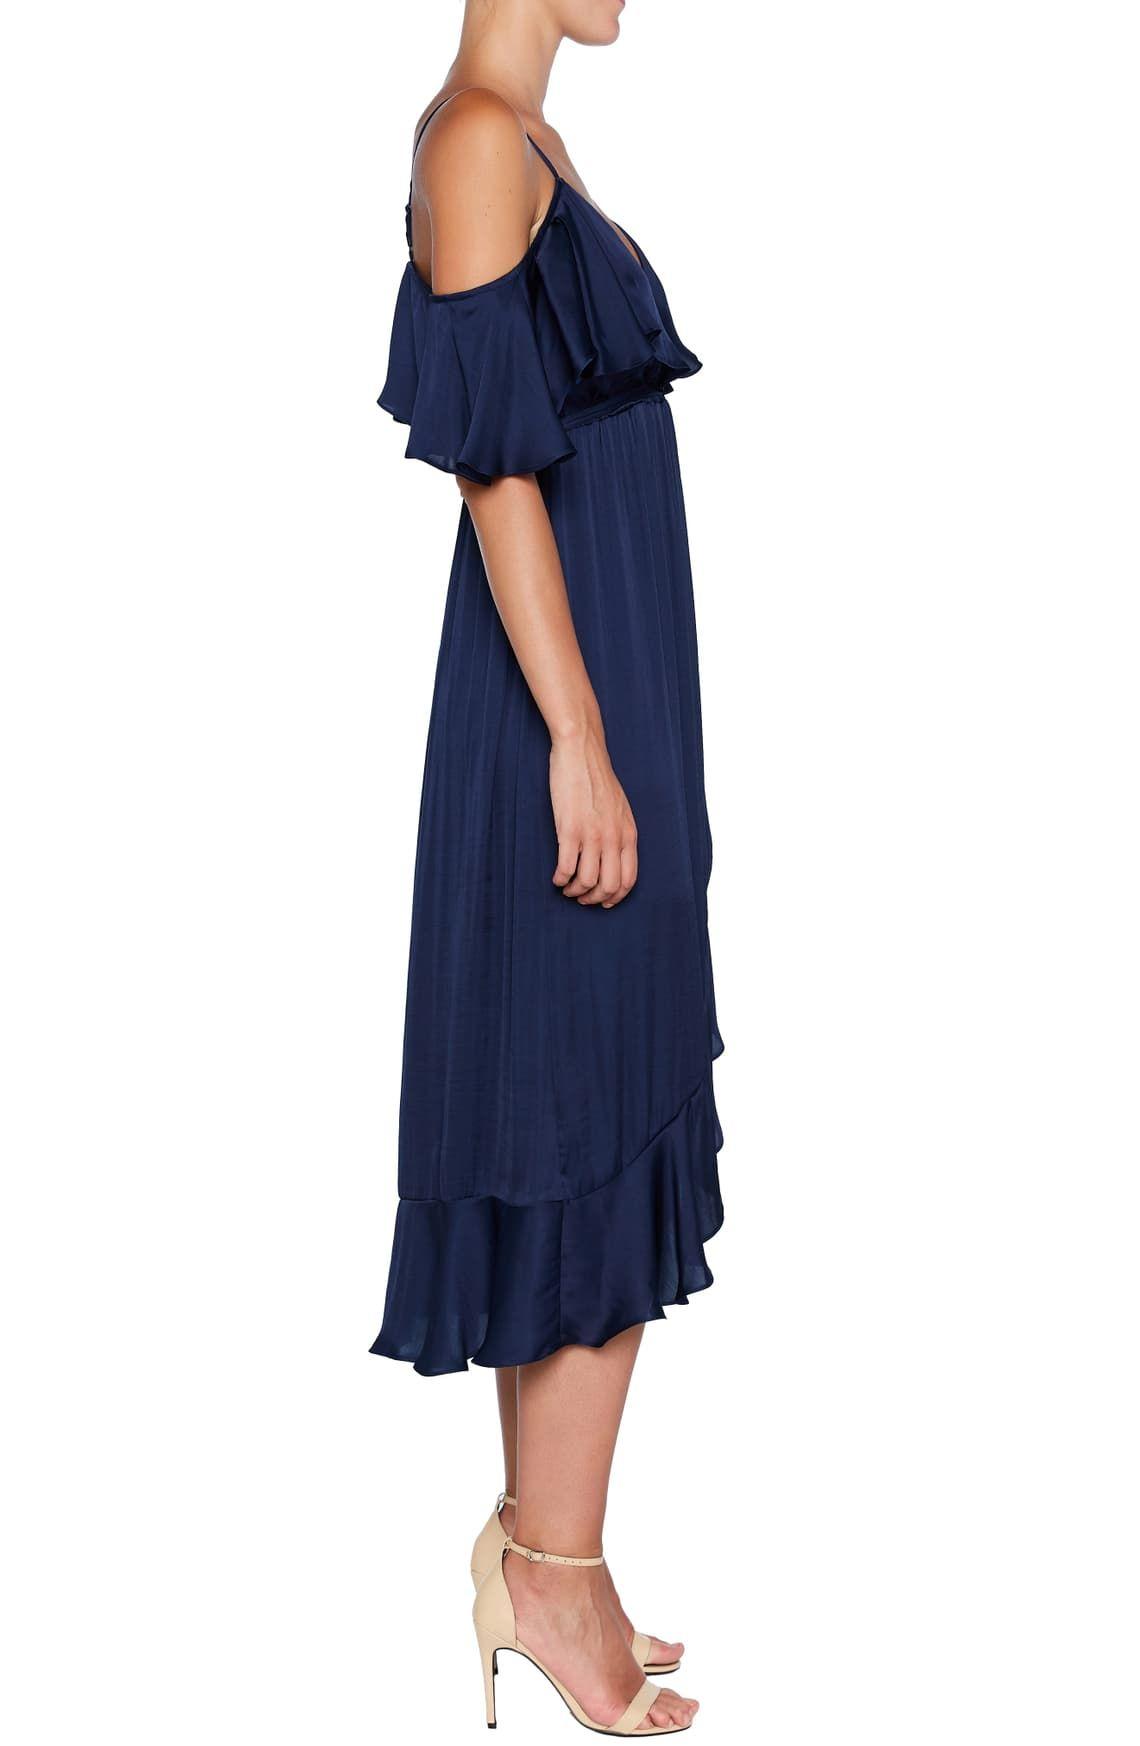 Bardot Bea Cold Shoulder Ruffle Dress Nordstrom Shoulder Ruffle Dress Nordstrom Dresses Ruffle Dress [ 1746 x 1140 Pixel ]